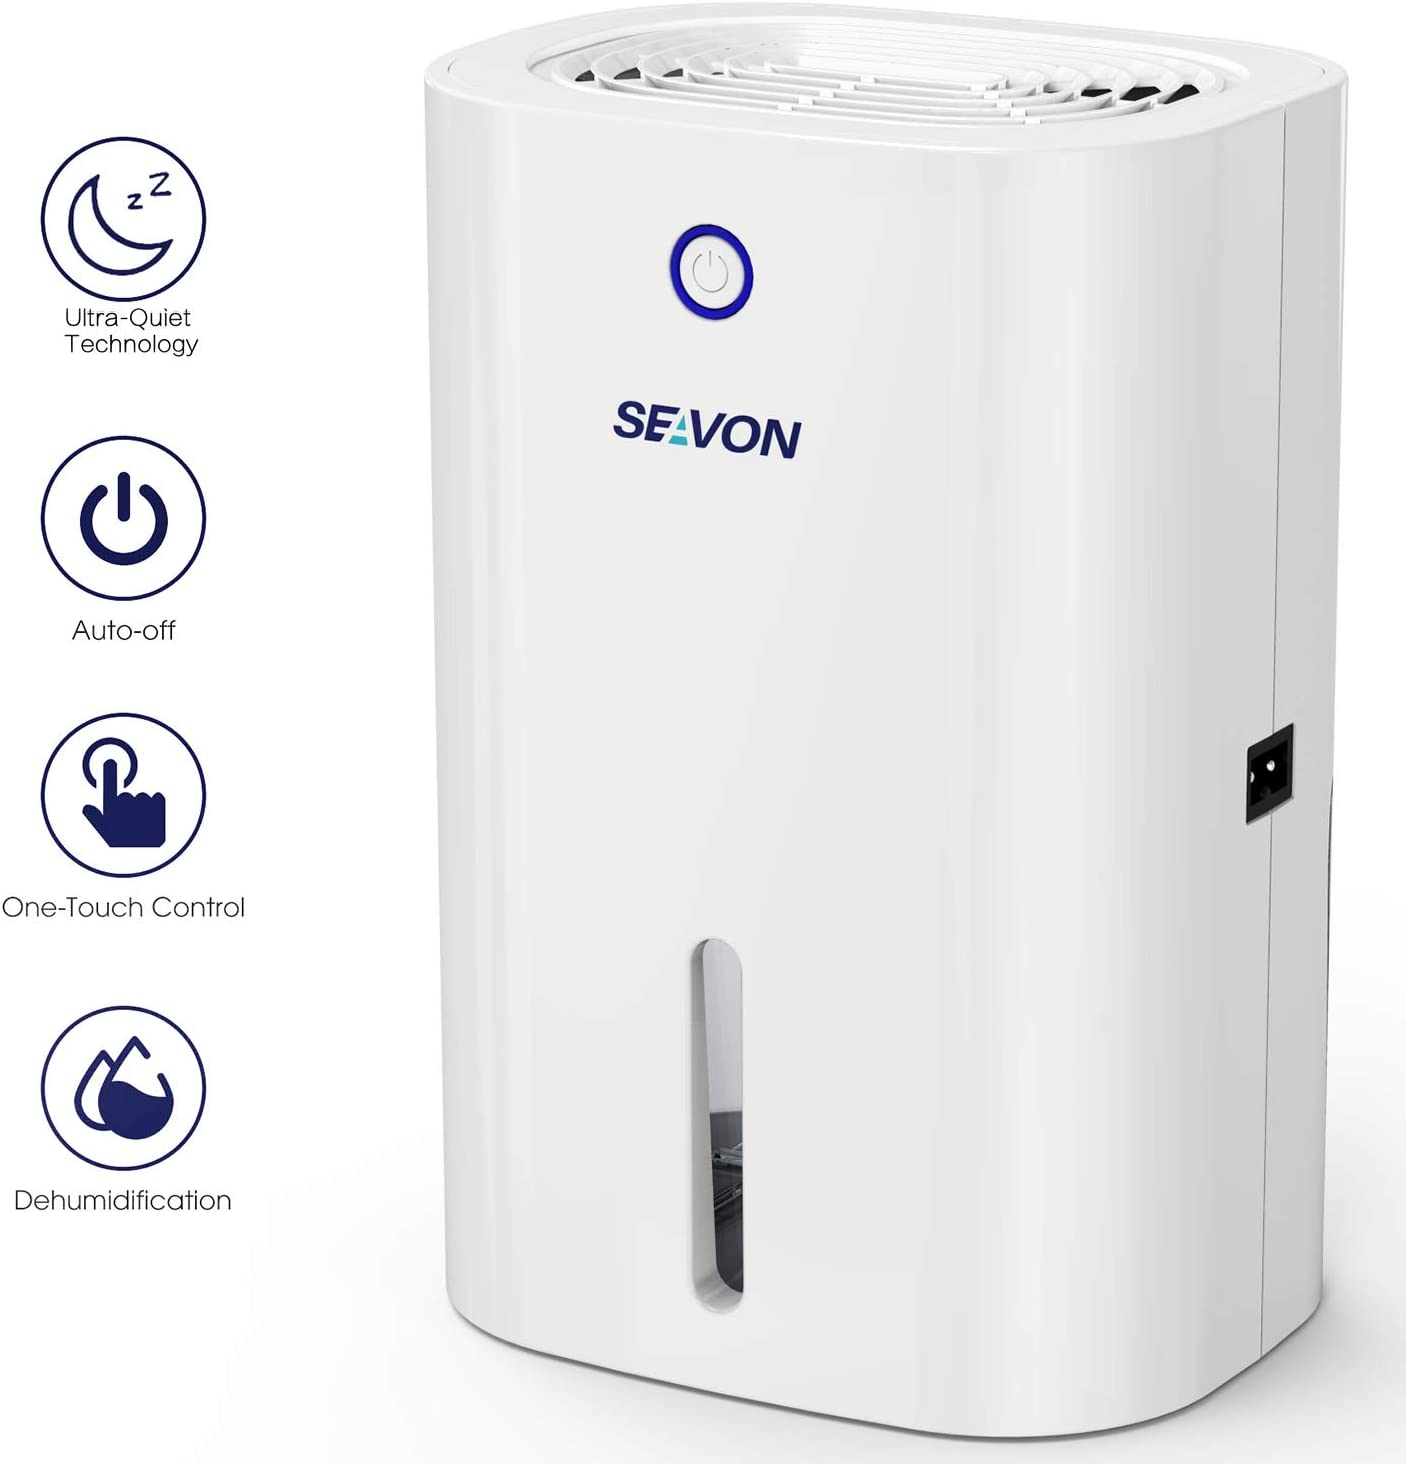 SEAVON Electric Small Dehumidifier, 2200 Cubic Feet (140- 220 sq ft), Auto Shut Off, Portable and Compact 800ml Capacity Quiet Small Dehumidifiers for Home, Basements, Closet, Bedroom, Bathroom, RV, Kitchen